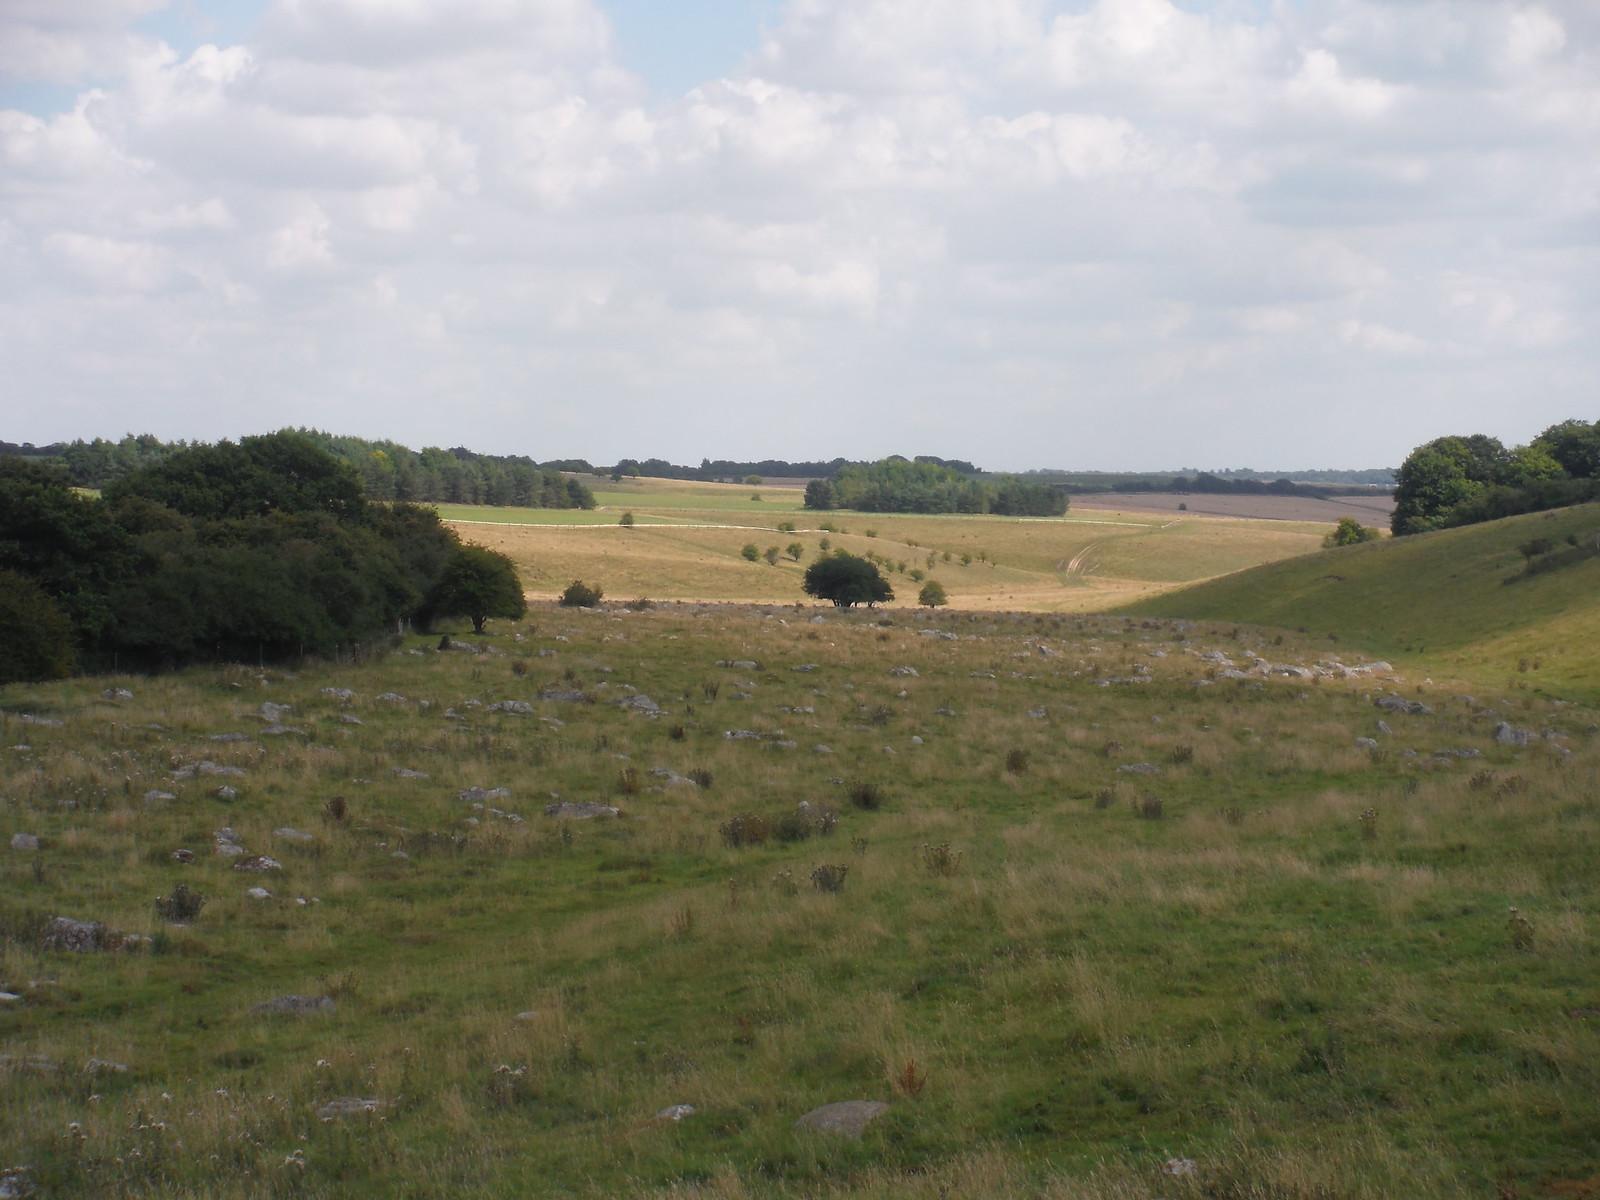 Fyfield Down Sarsen Stone Field, view from the West SWC Walk 255 Pewsey or Marlborough Circular via Avebury